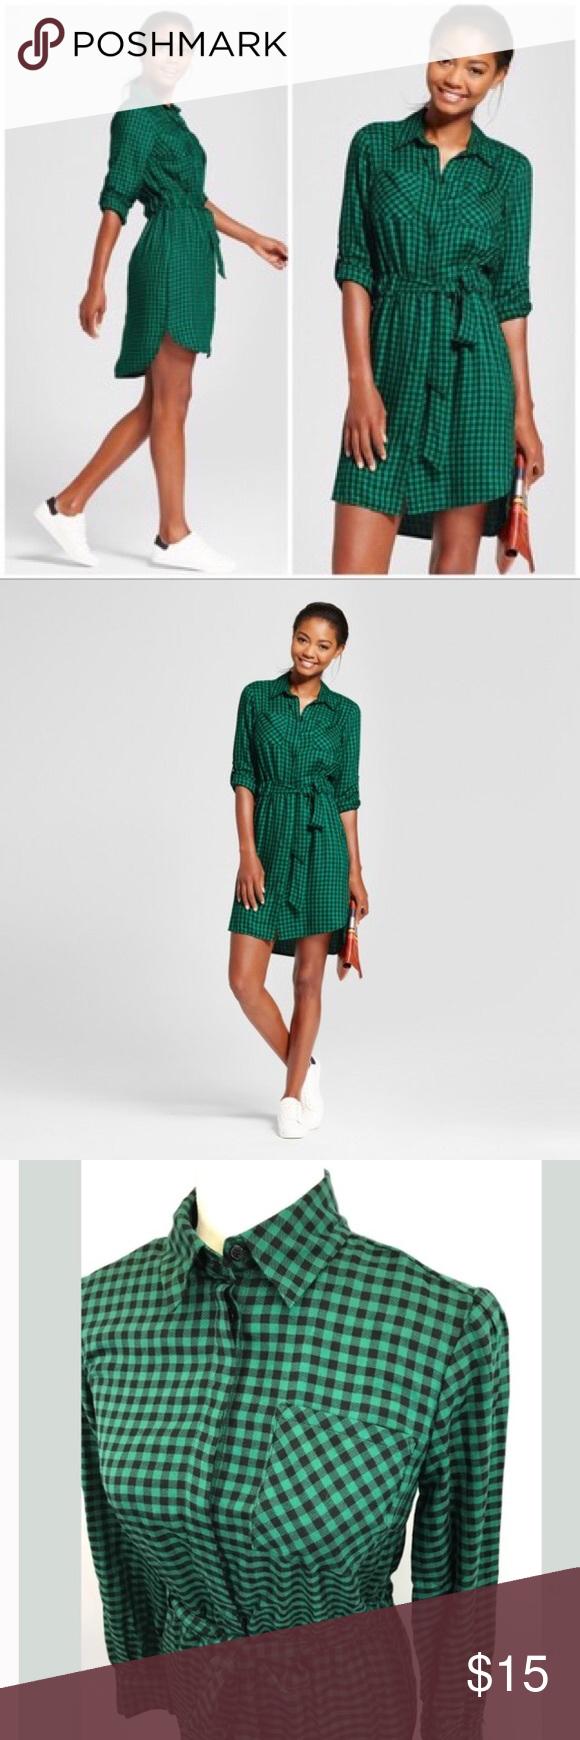 A New Day Target Gingham Green Dress Size M Green Dress Clothes Design Dresses [ 1740 x 580 Pixel ]